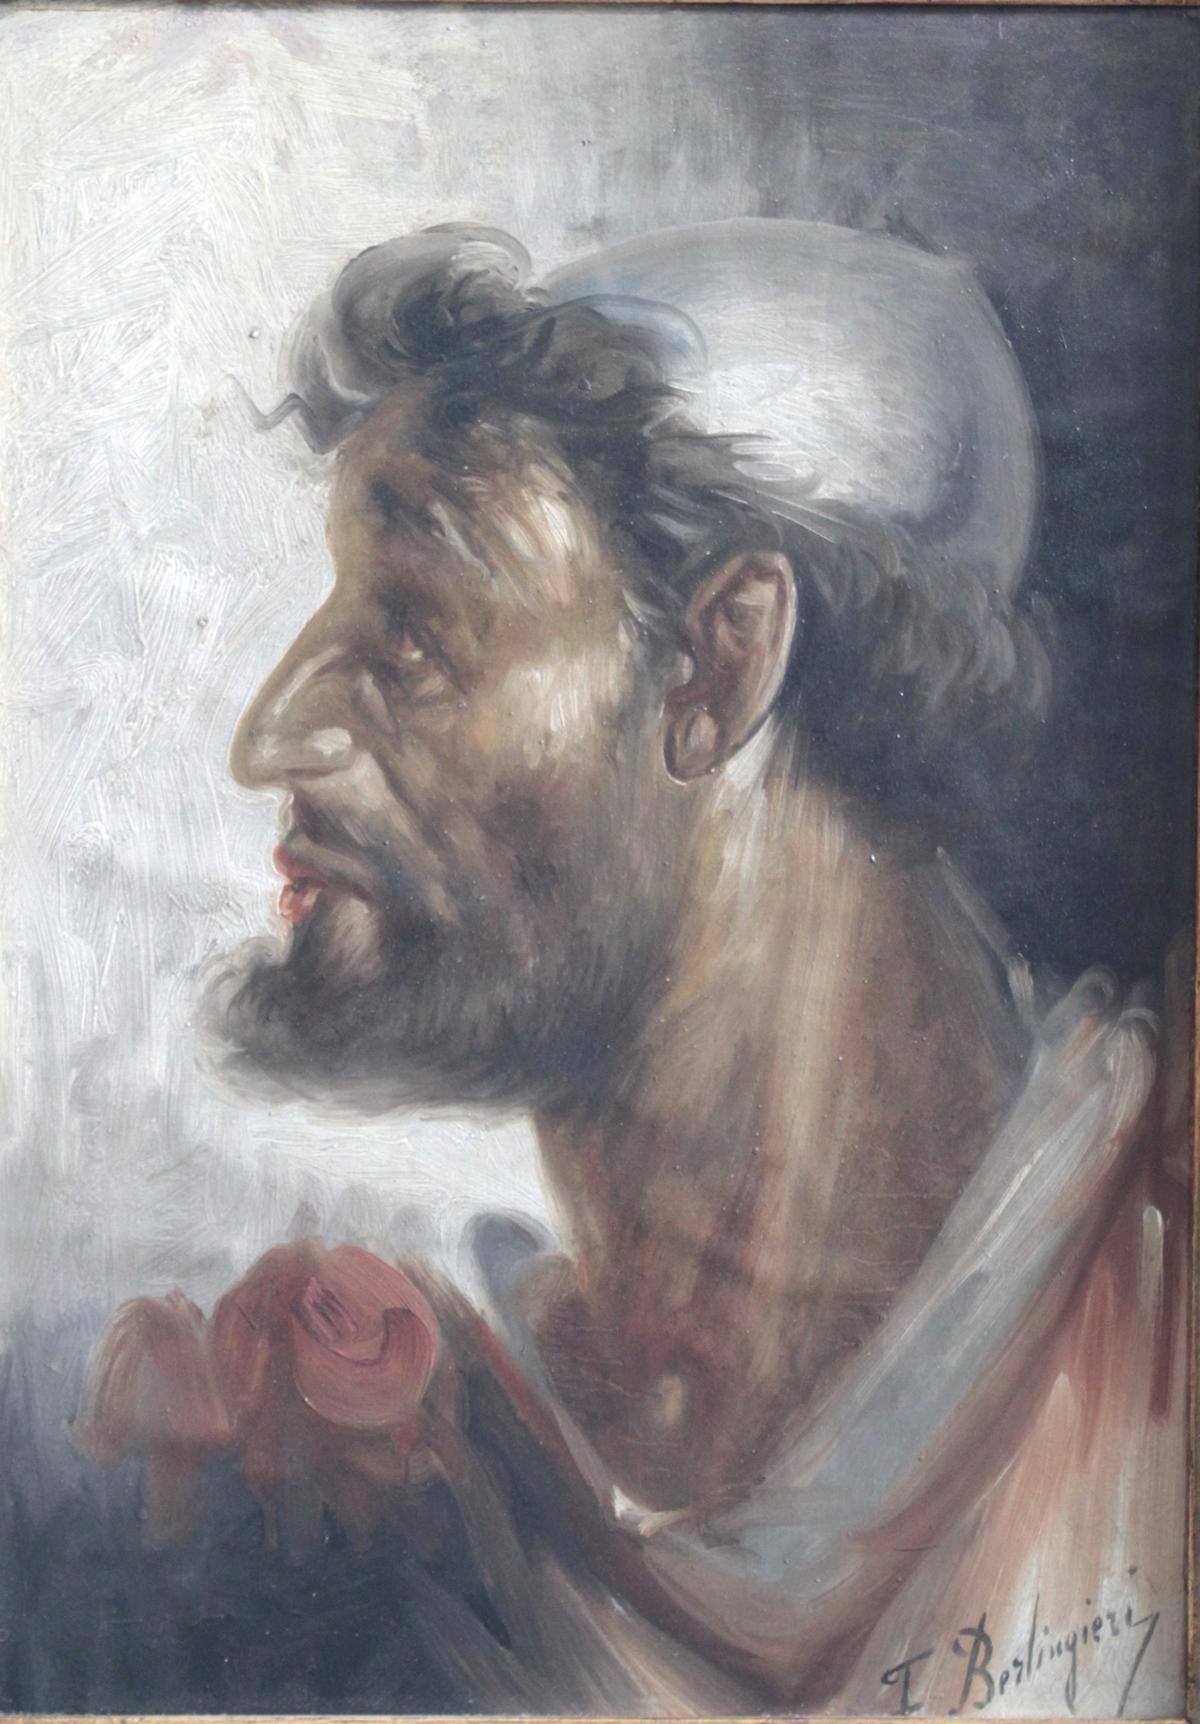 F. Berlingieri ? – ?, Herrenporträt im Profil-2